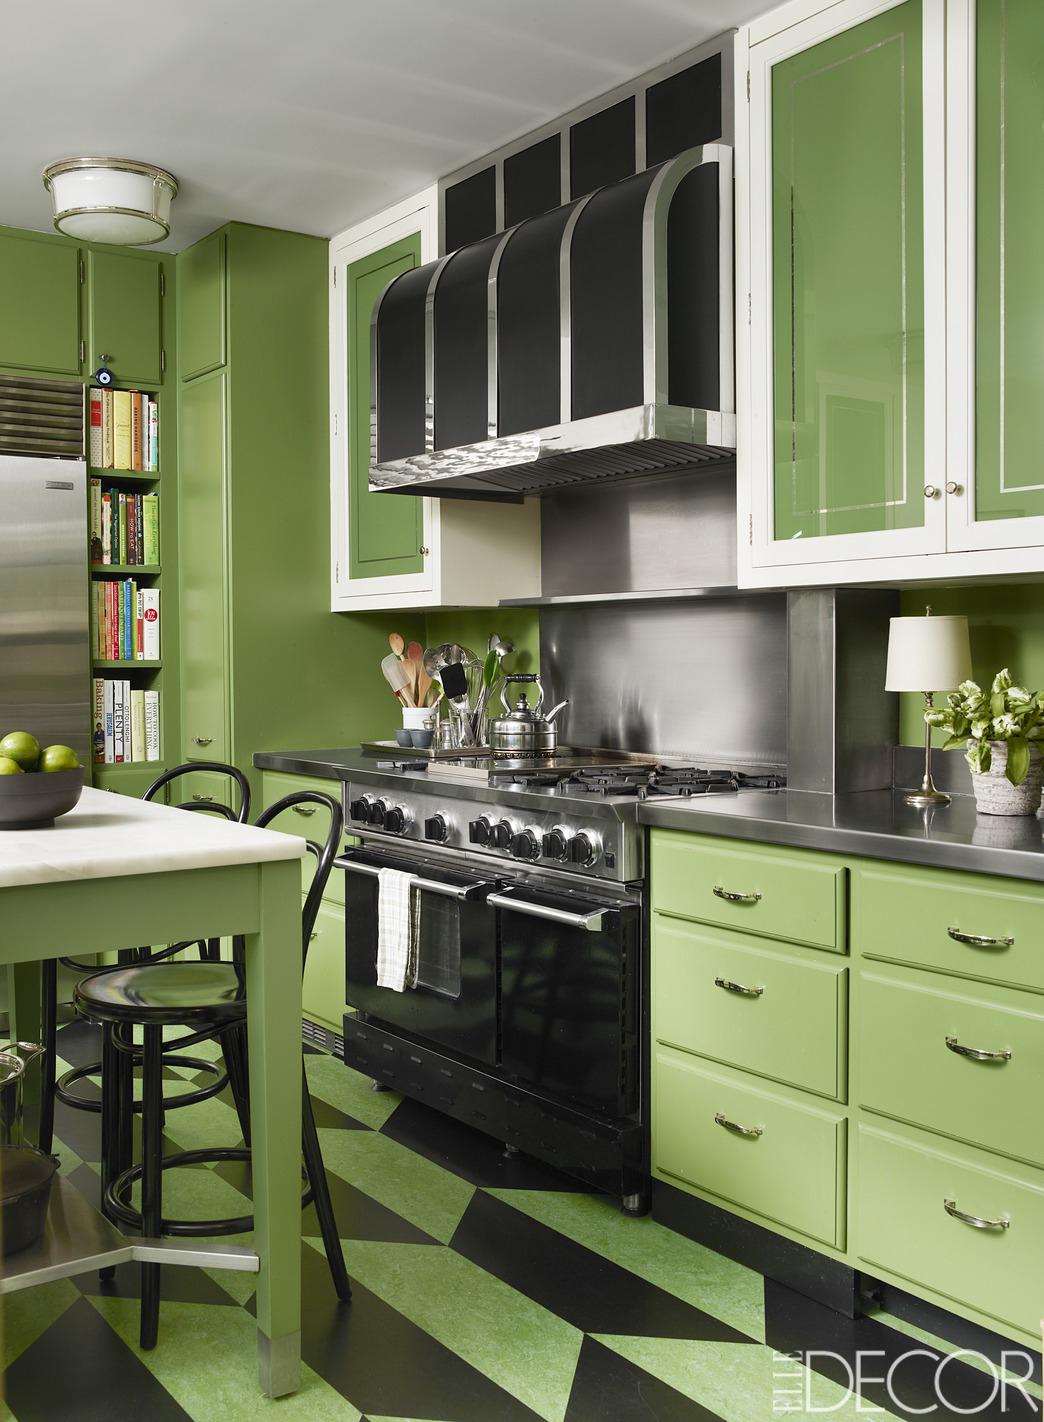 small kitchen designs 40 small kitchen design ideas - decorating tiny kitchens UONHLYG